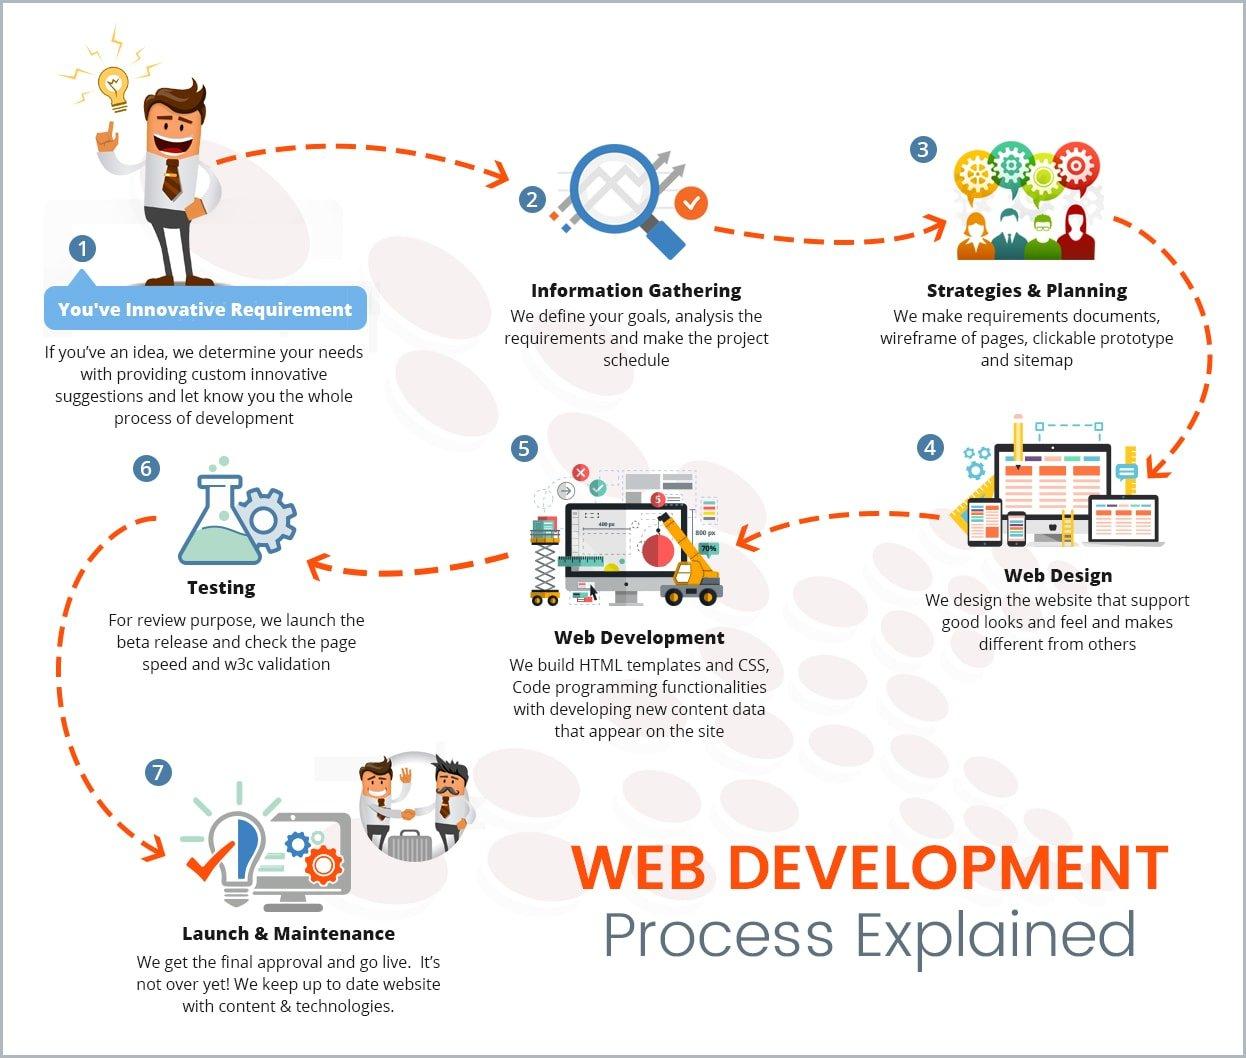 web-development-process-explained